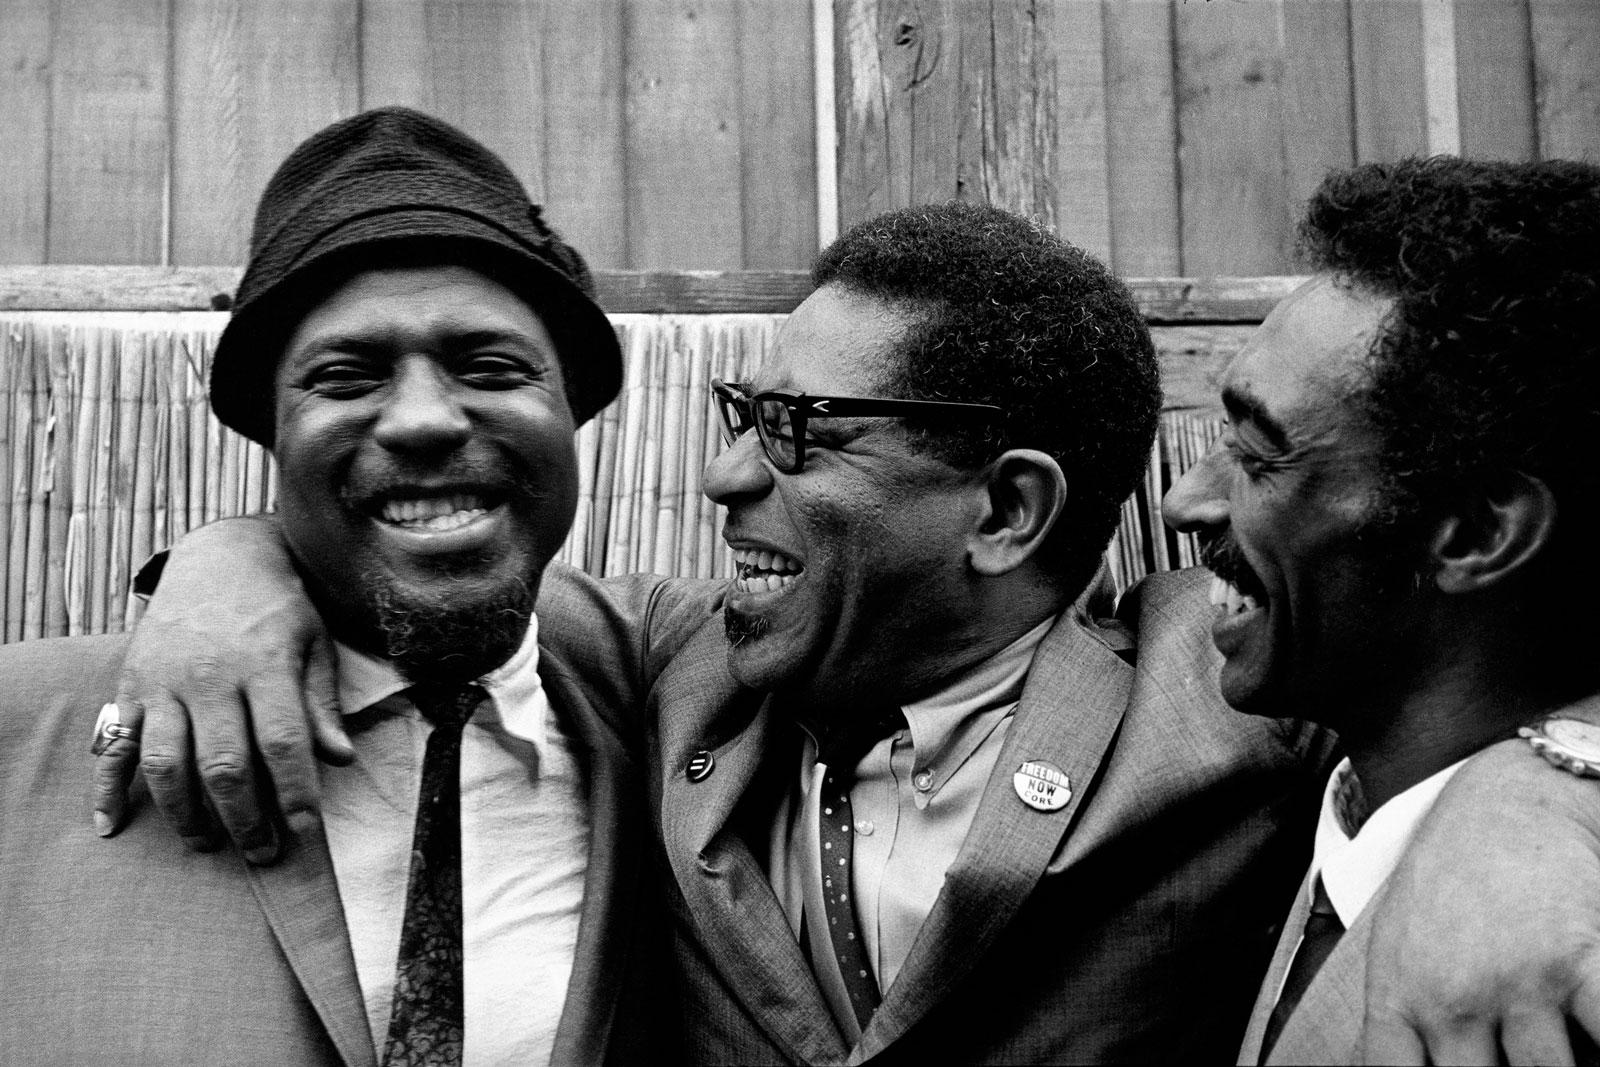 Thelonious Monk, Dizzy Gillespie, and Gerald Wilson, Monterey, 1963